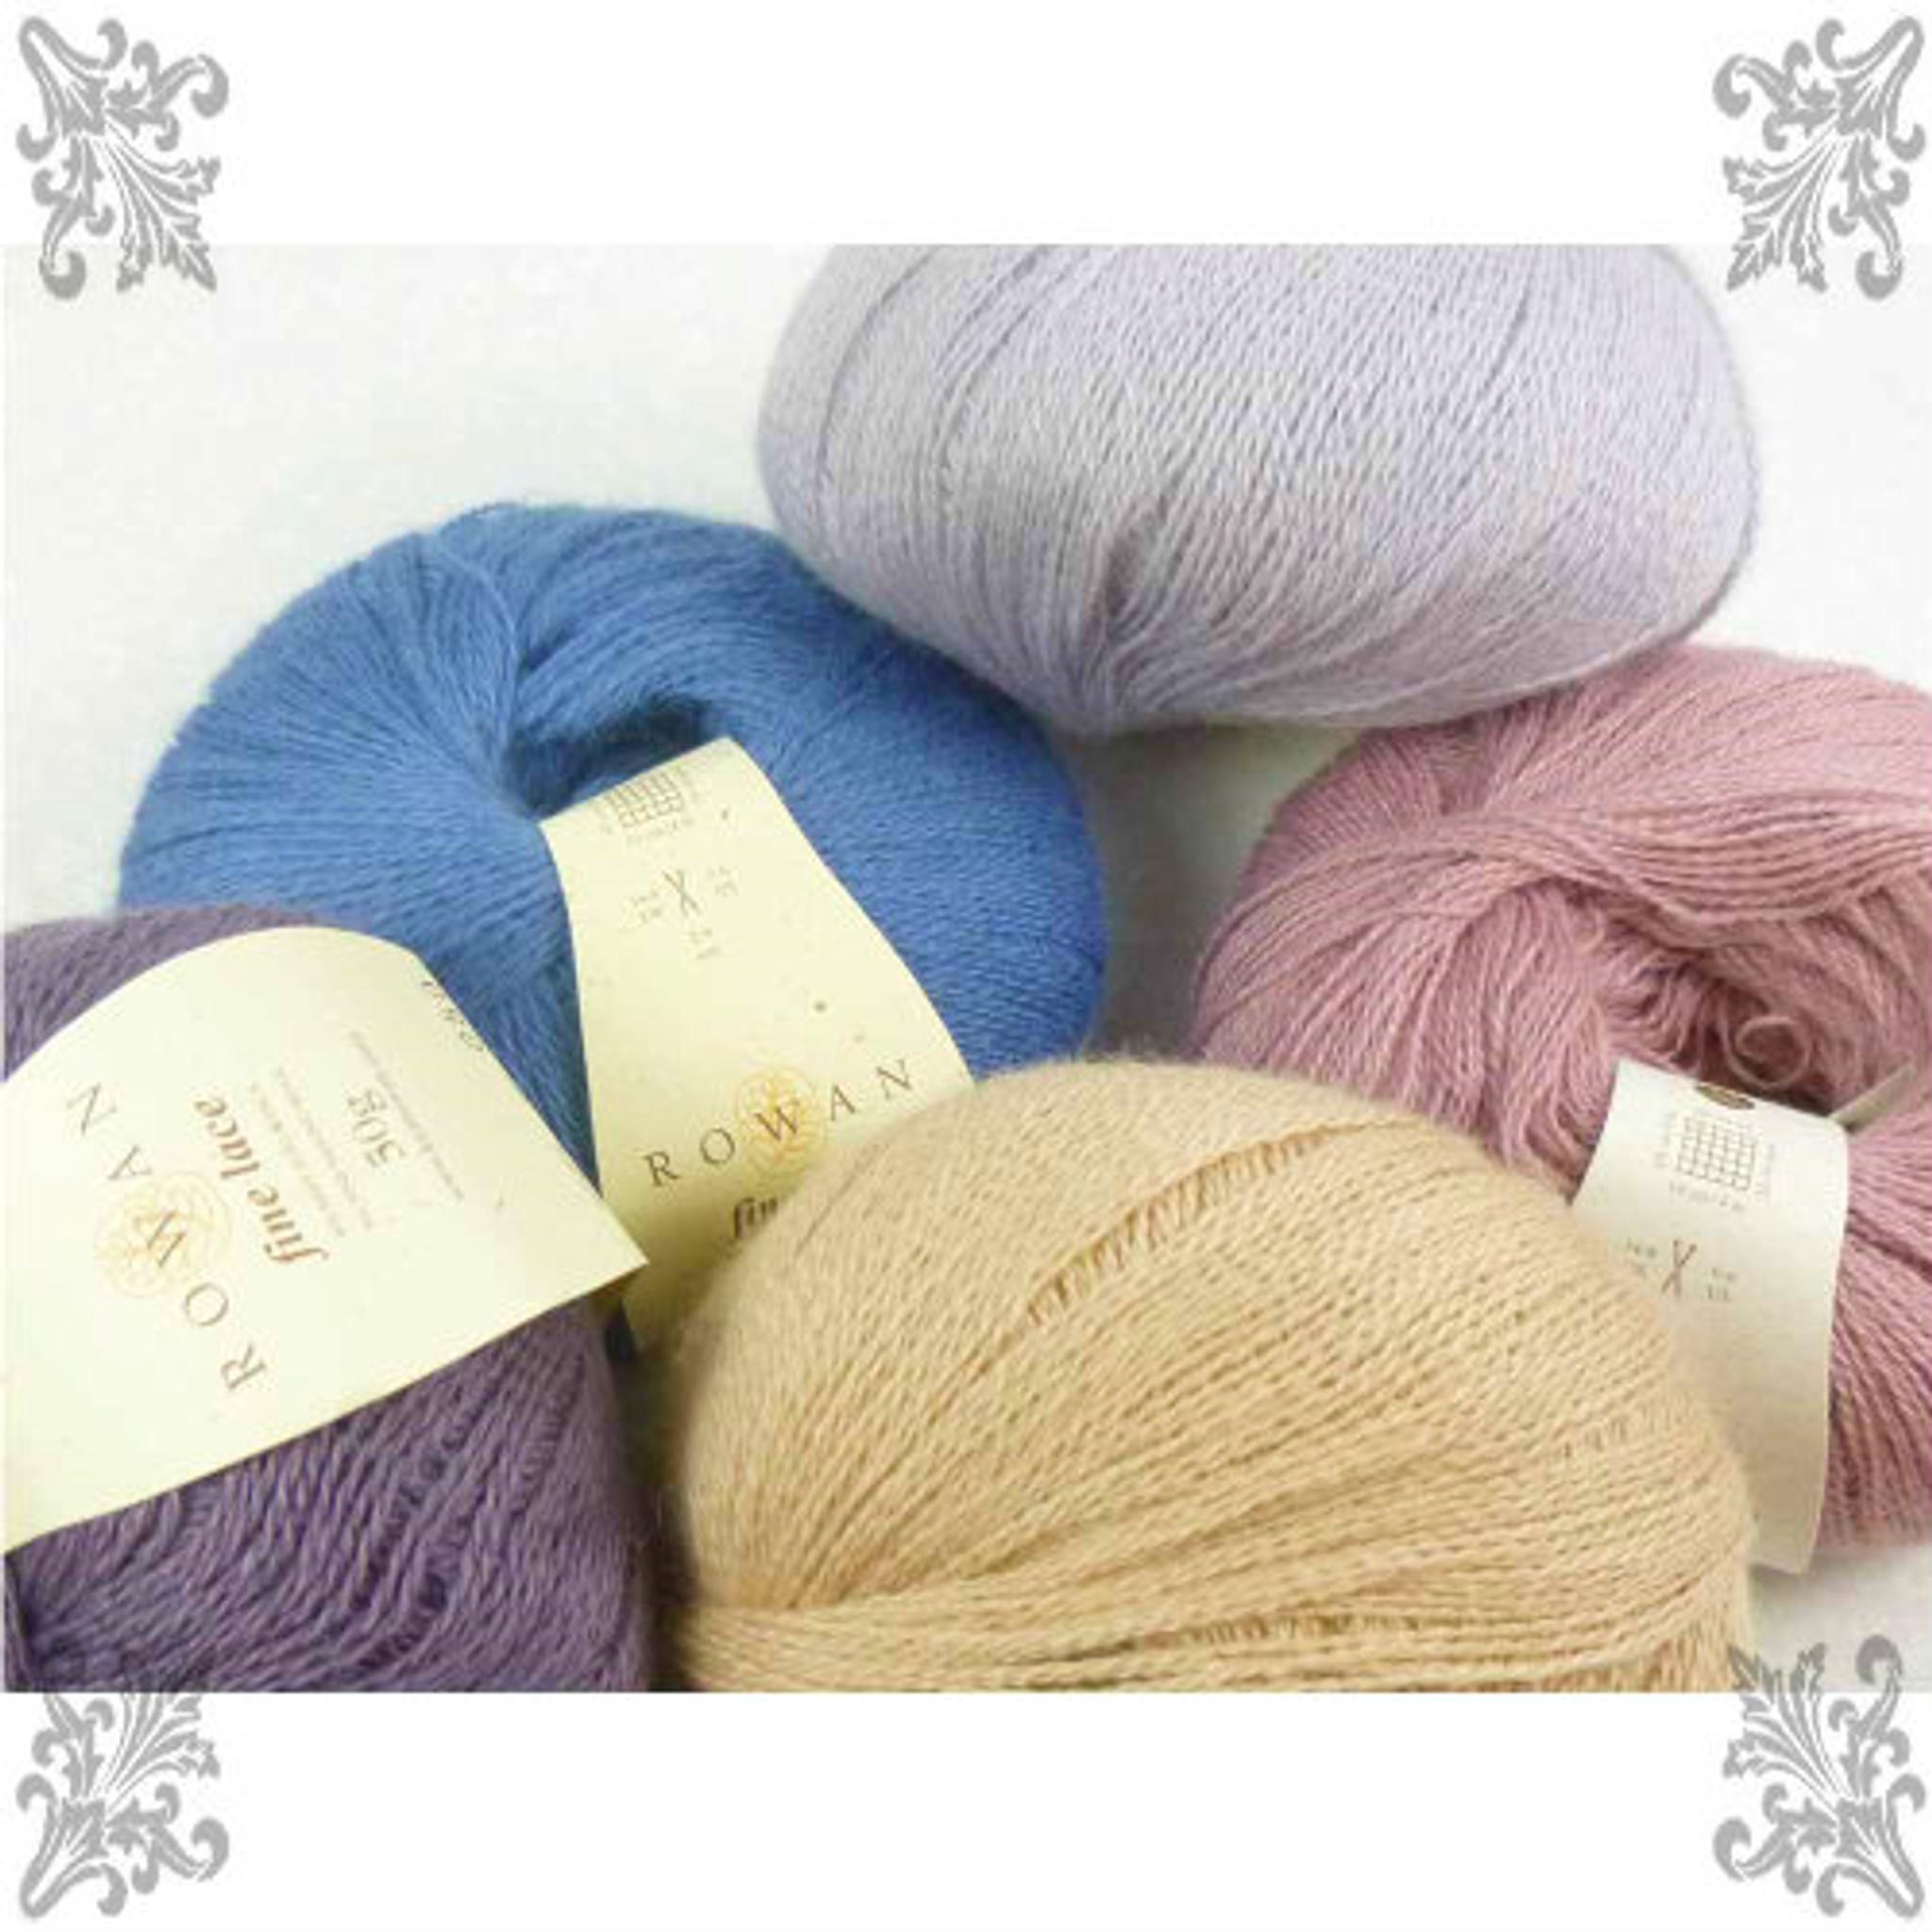 Rowan Fine Lace Knitting Yarn, 50g Balls   Various Shades